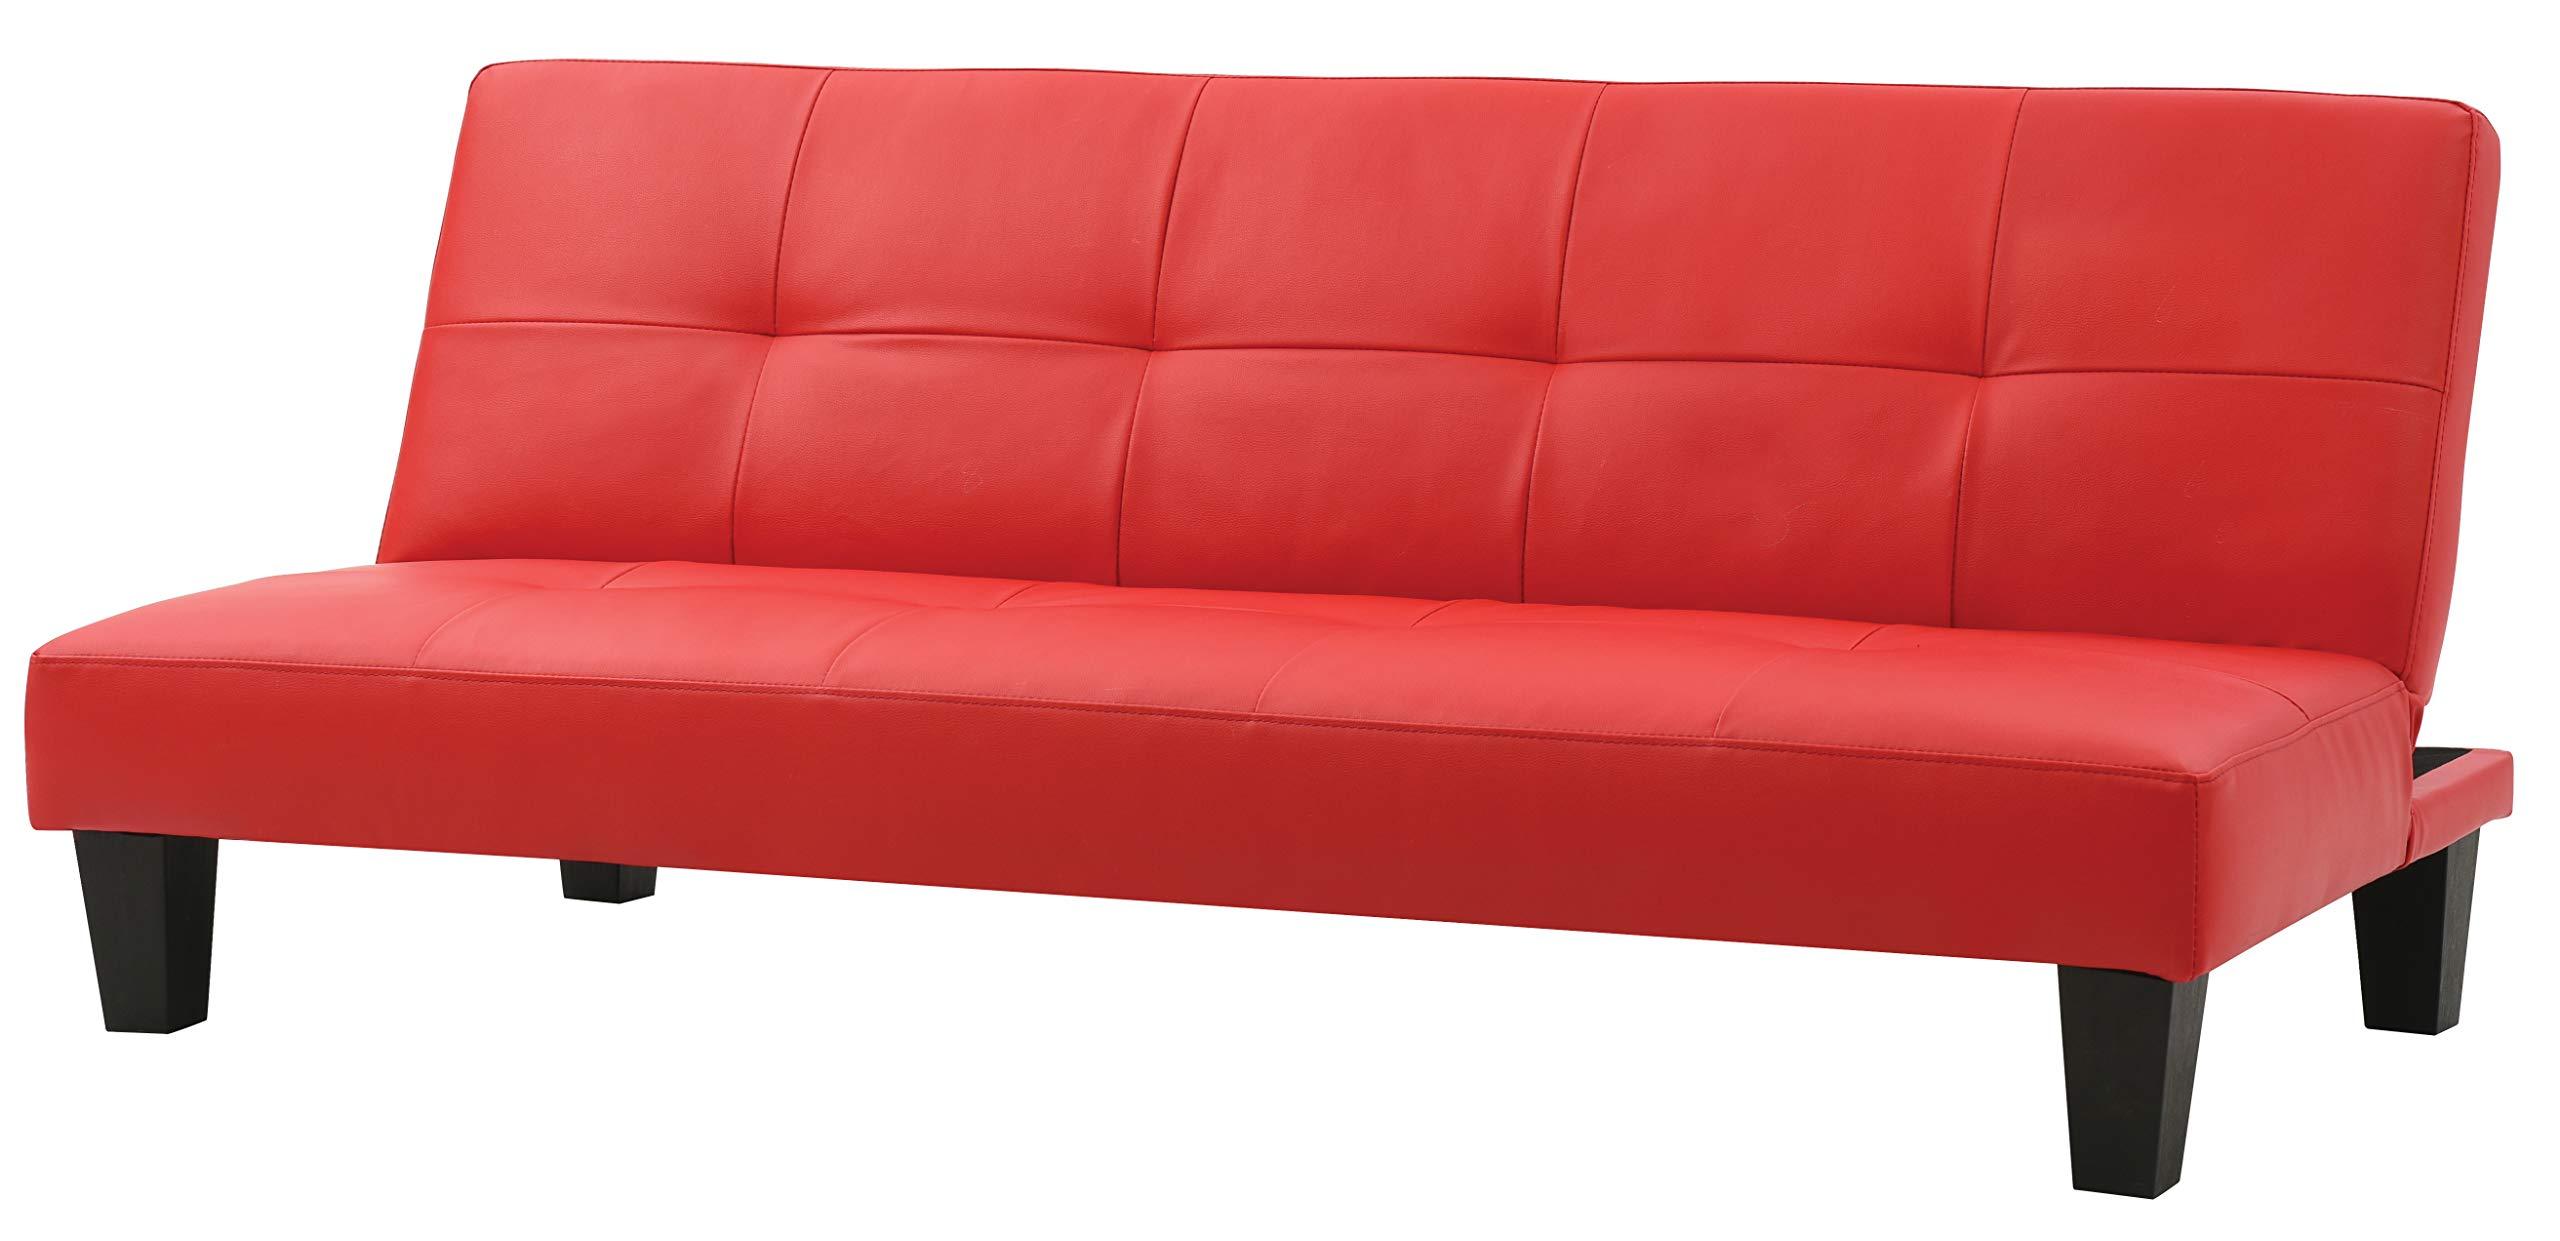 Glory Furniture G112-S Klik Klak Sofa Bed, Red/Black by Glory Furniture